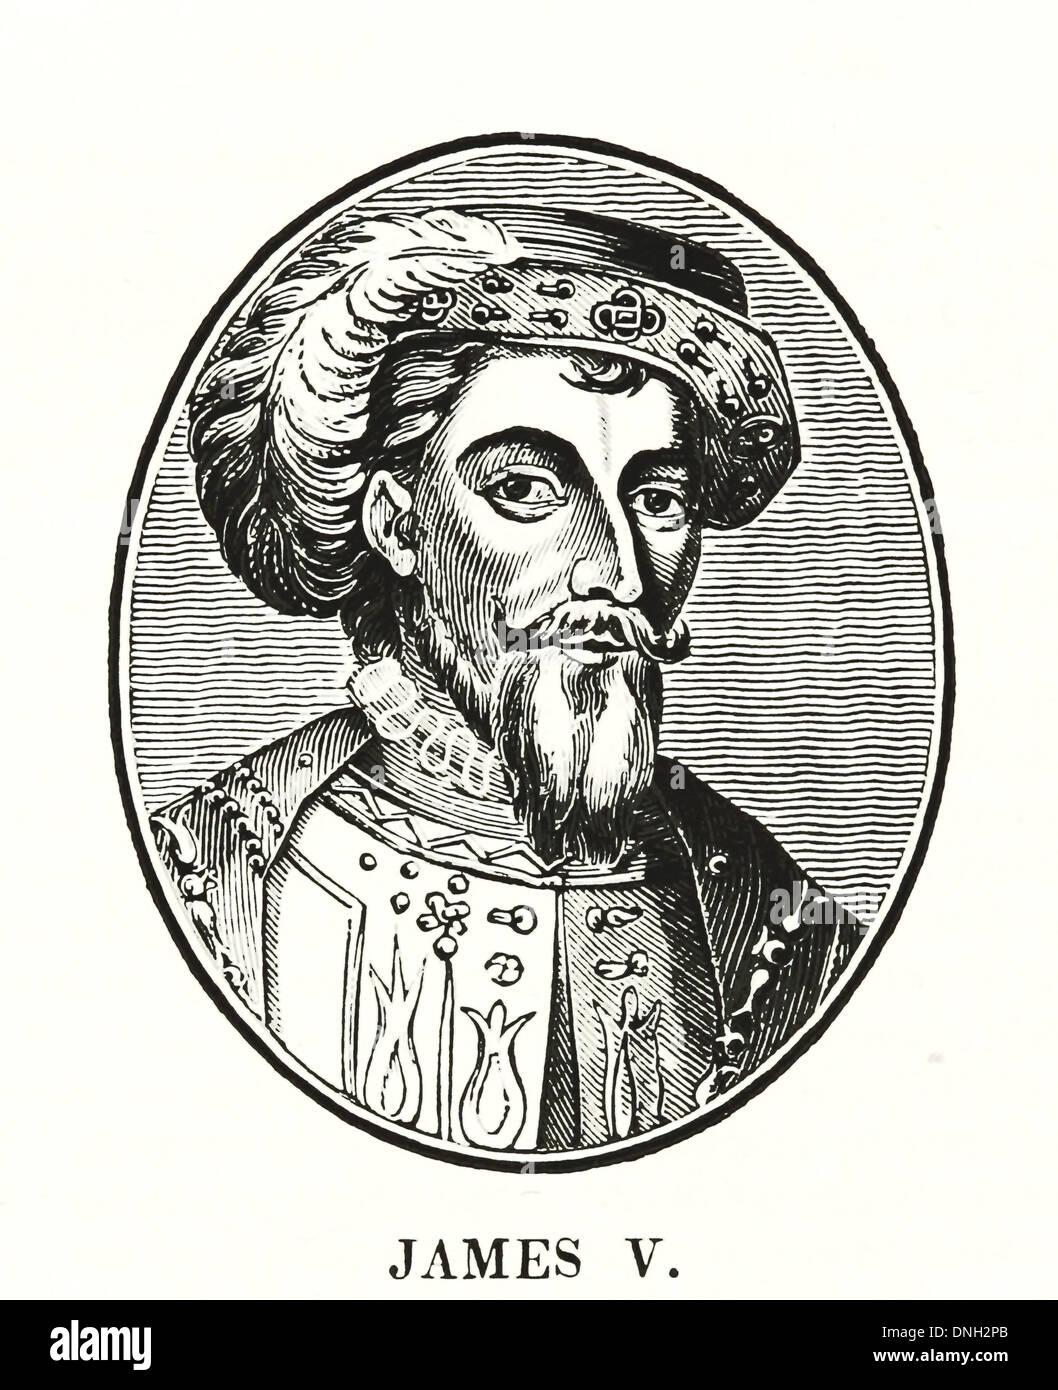 James V - King of Scots James V (10 April 1512 – 14 December 1542) was King of Scots from 9 September 1513 until his death - Stock Image